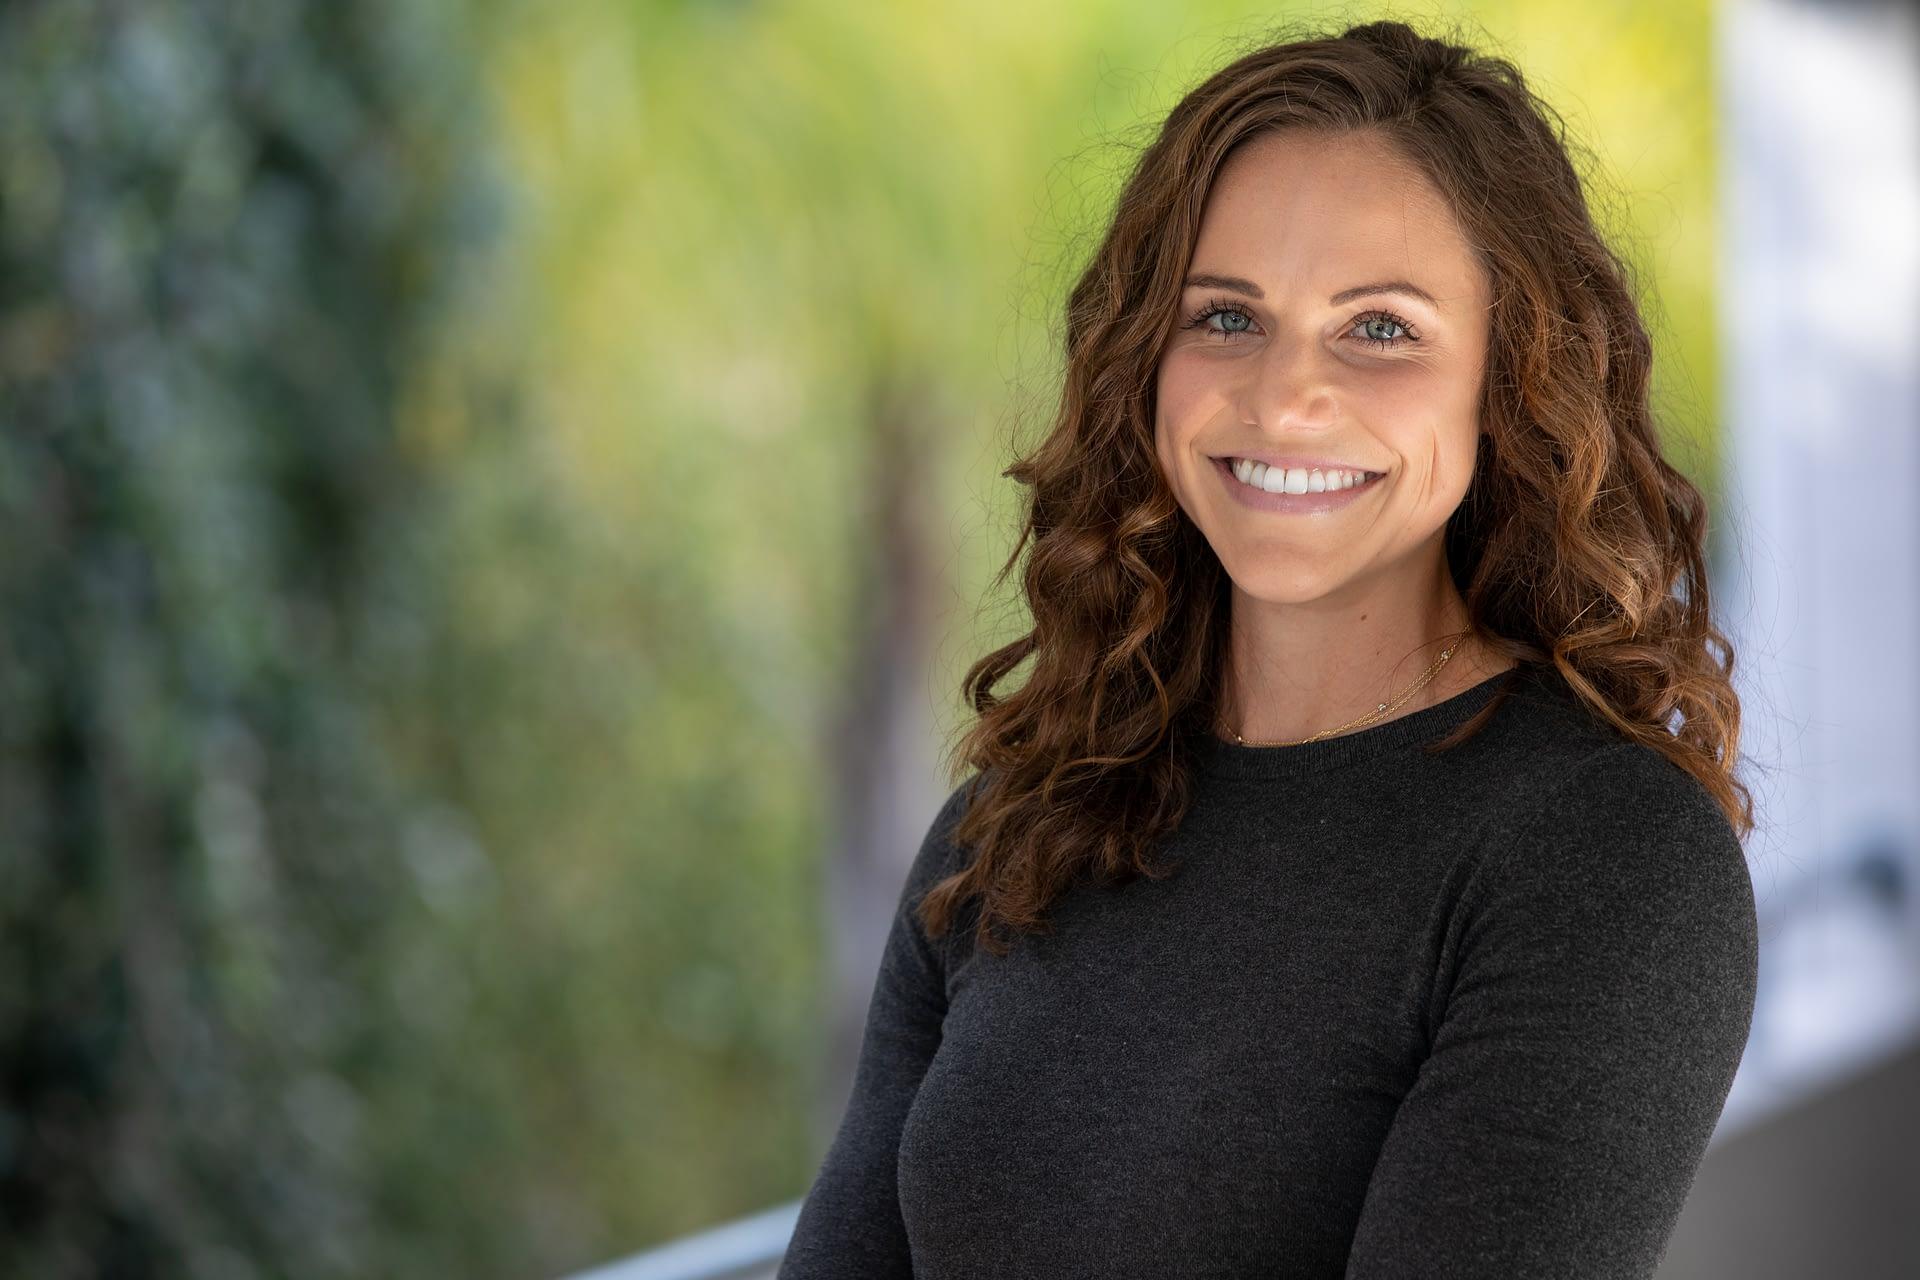 Sydney Professional Relationship Director, Dana Point CA